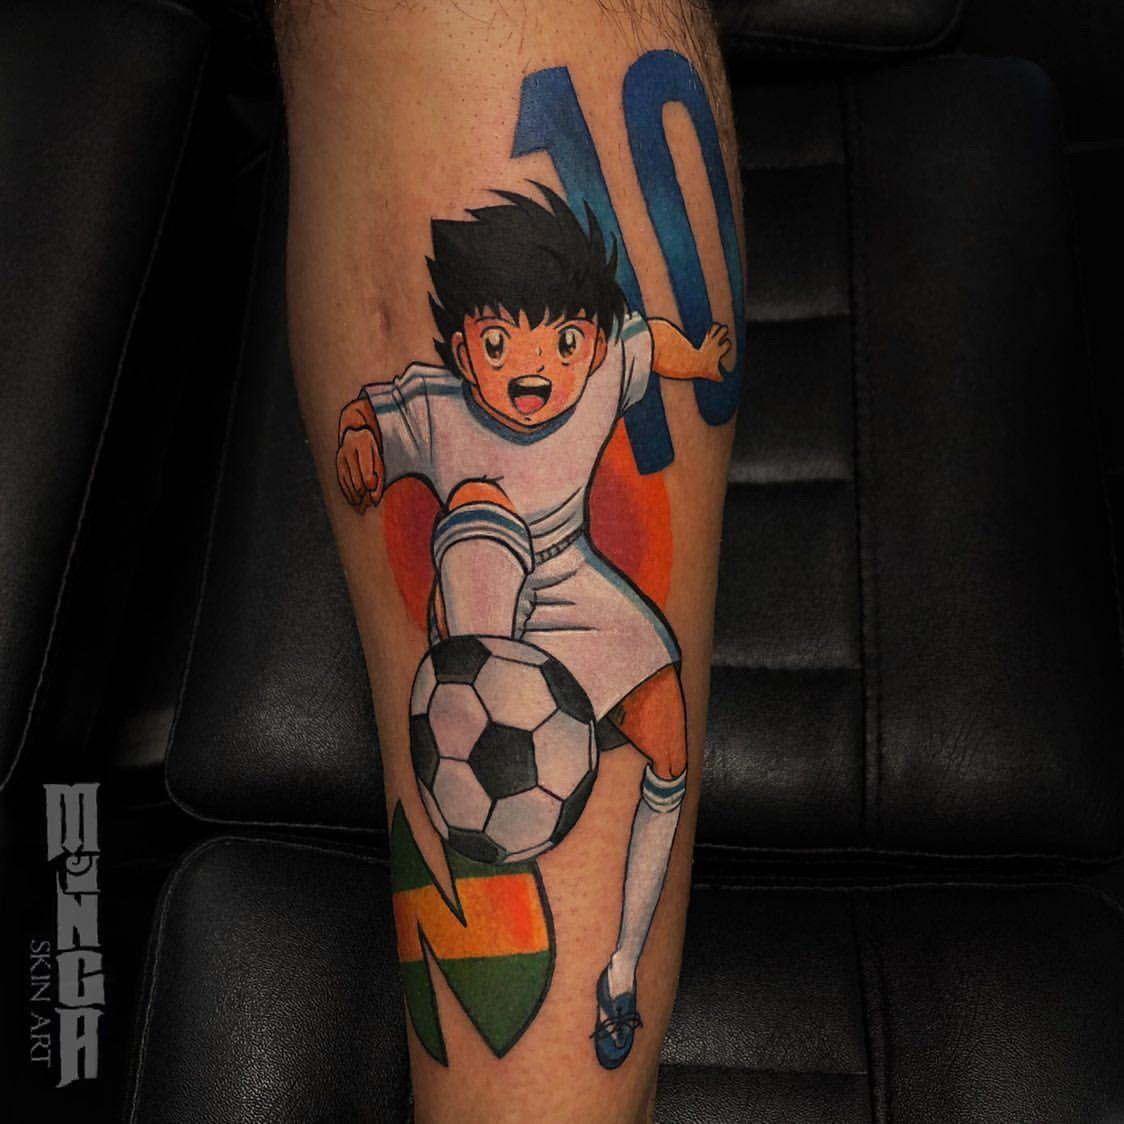 By @minga_skinart #tattoodefender #tattoodefenderteam #tattoodefenderaftercare #tatuati #tatuatori #loveyourskin #holly&benji #cartoontattoo #cartoon #calcio #manga #tattoomanga #